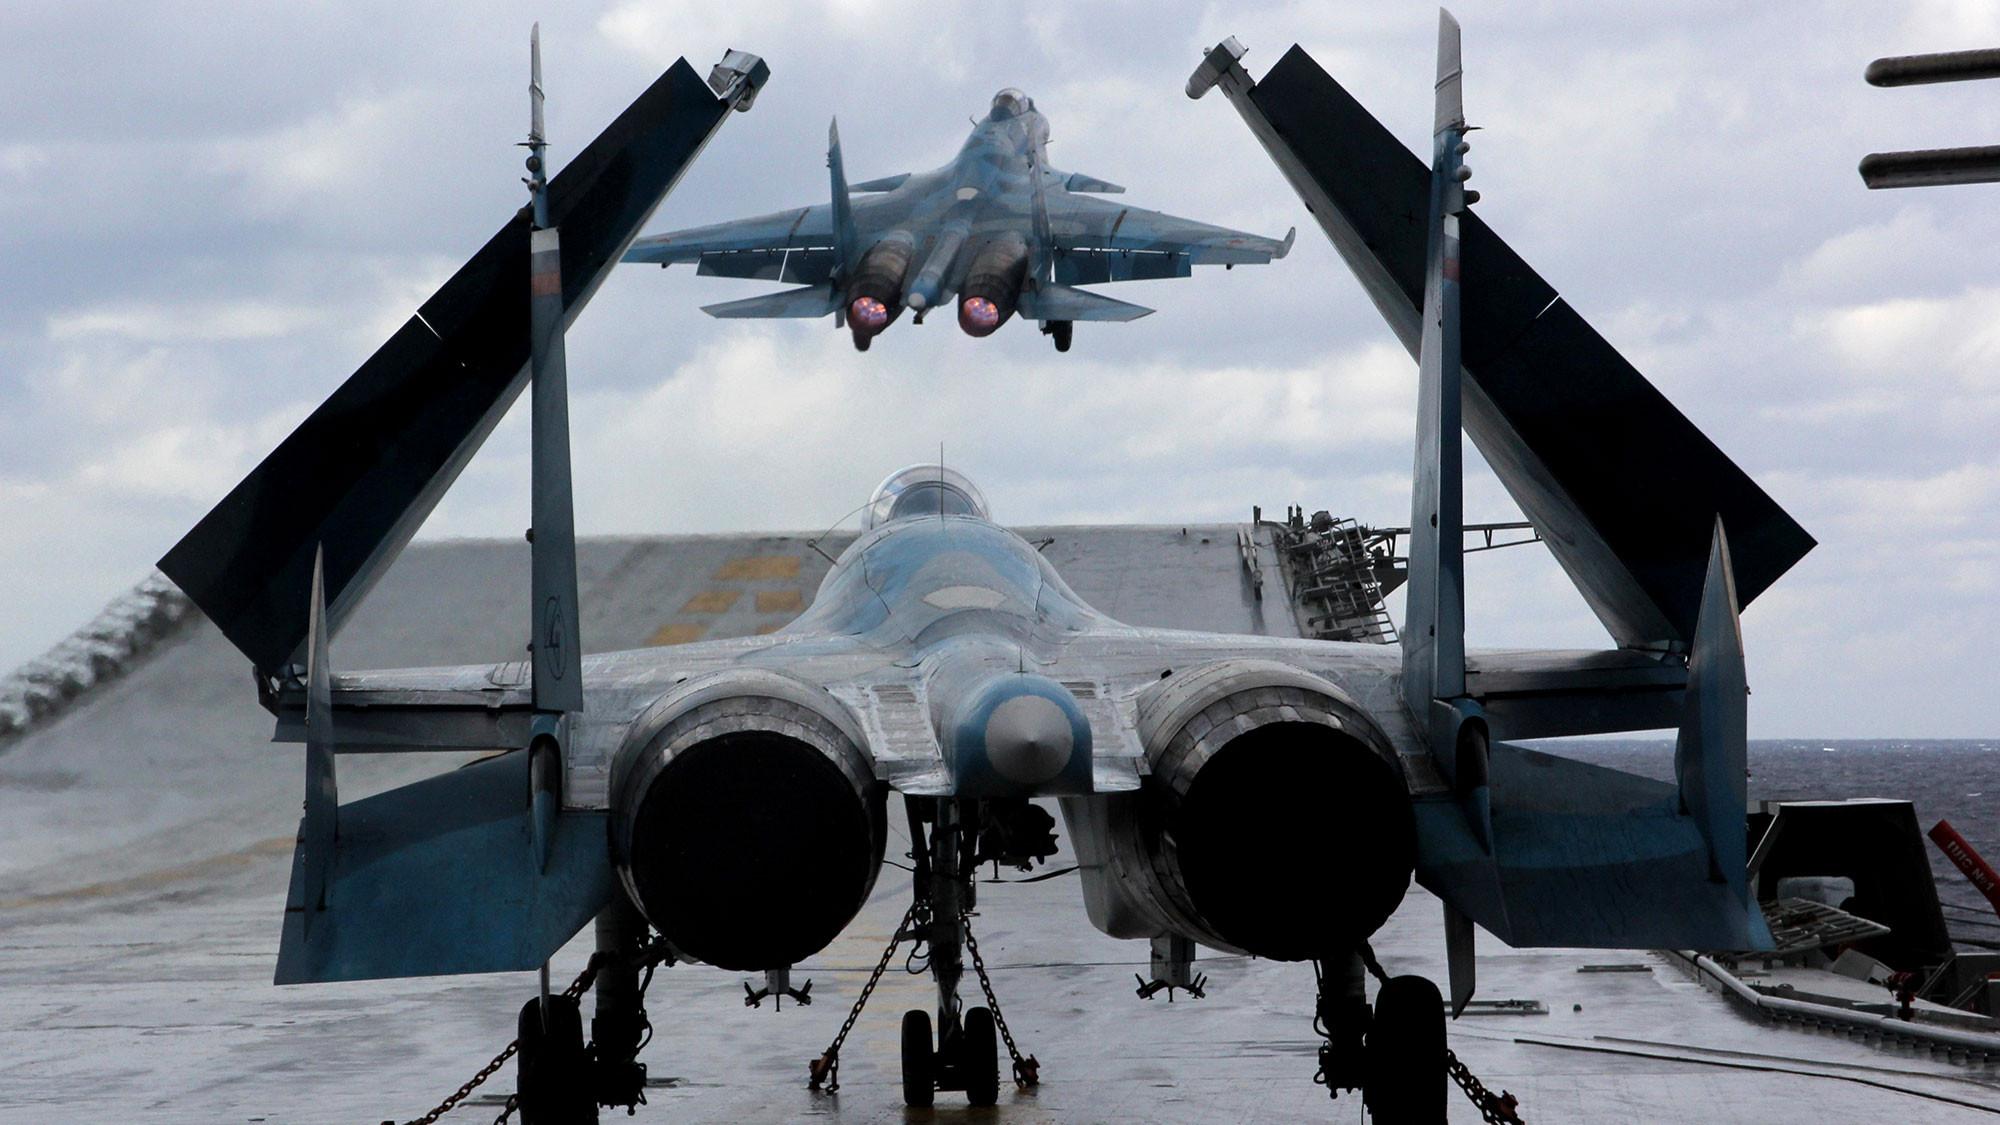 <p>Фото: &copy; РИА Новости /&nbsp;Андрей Лузик</p>